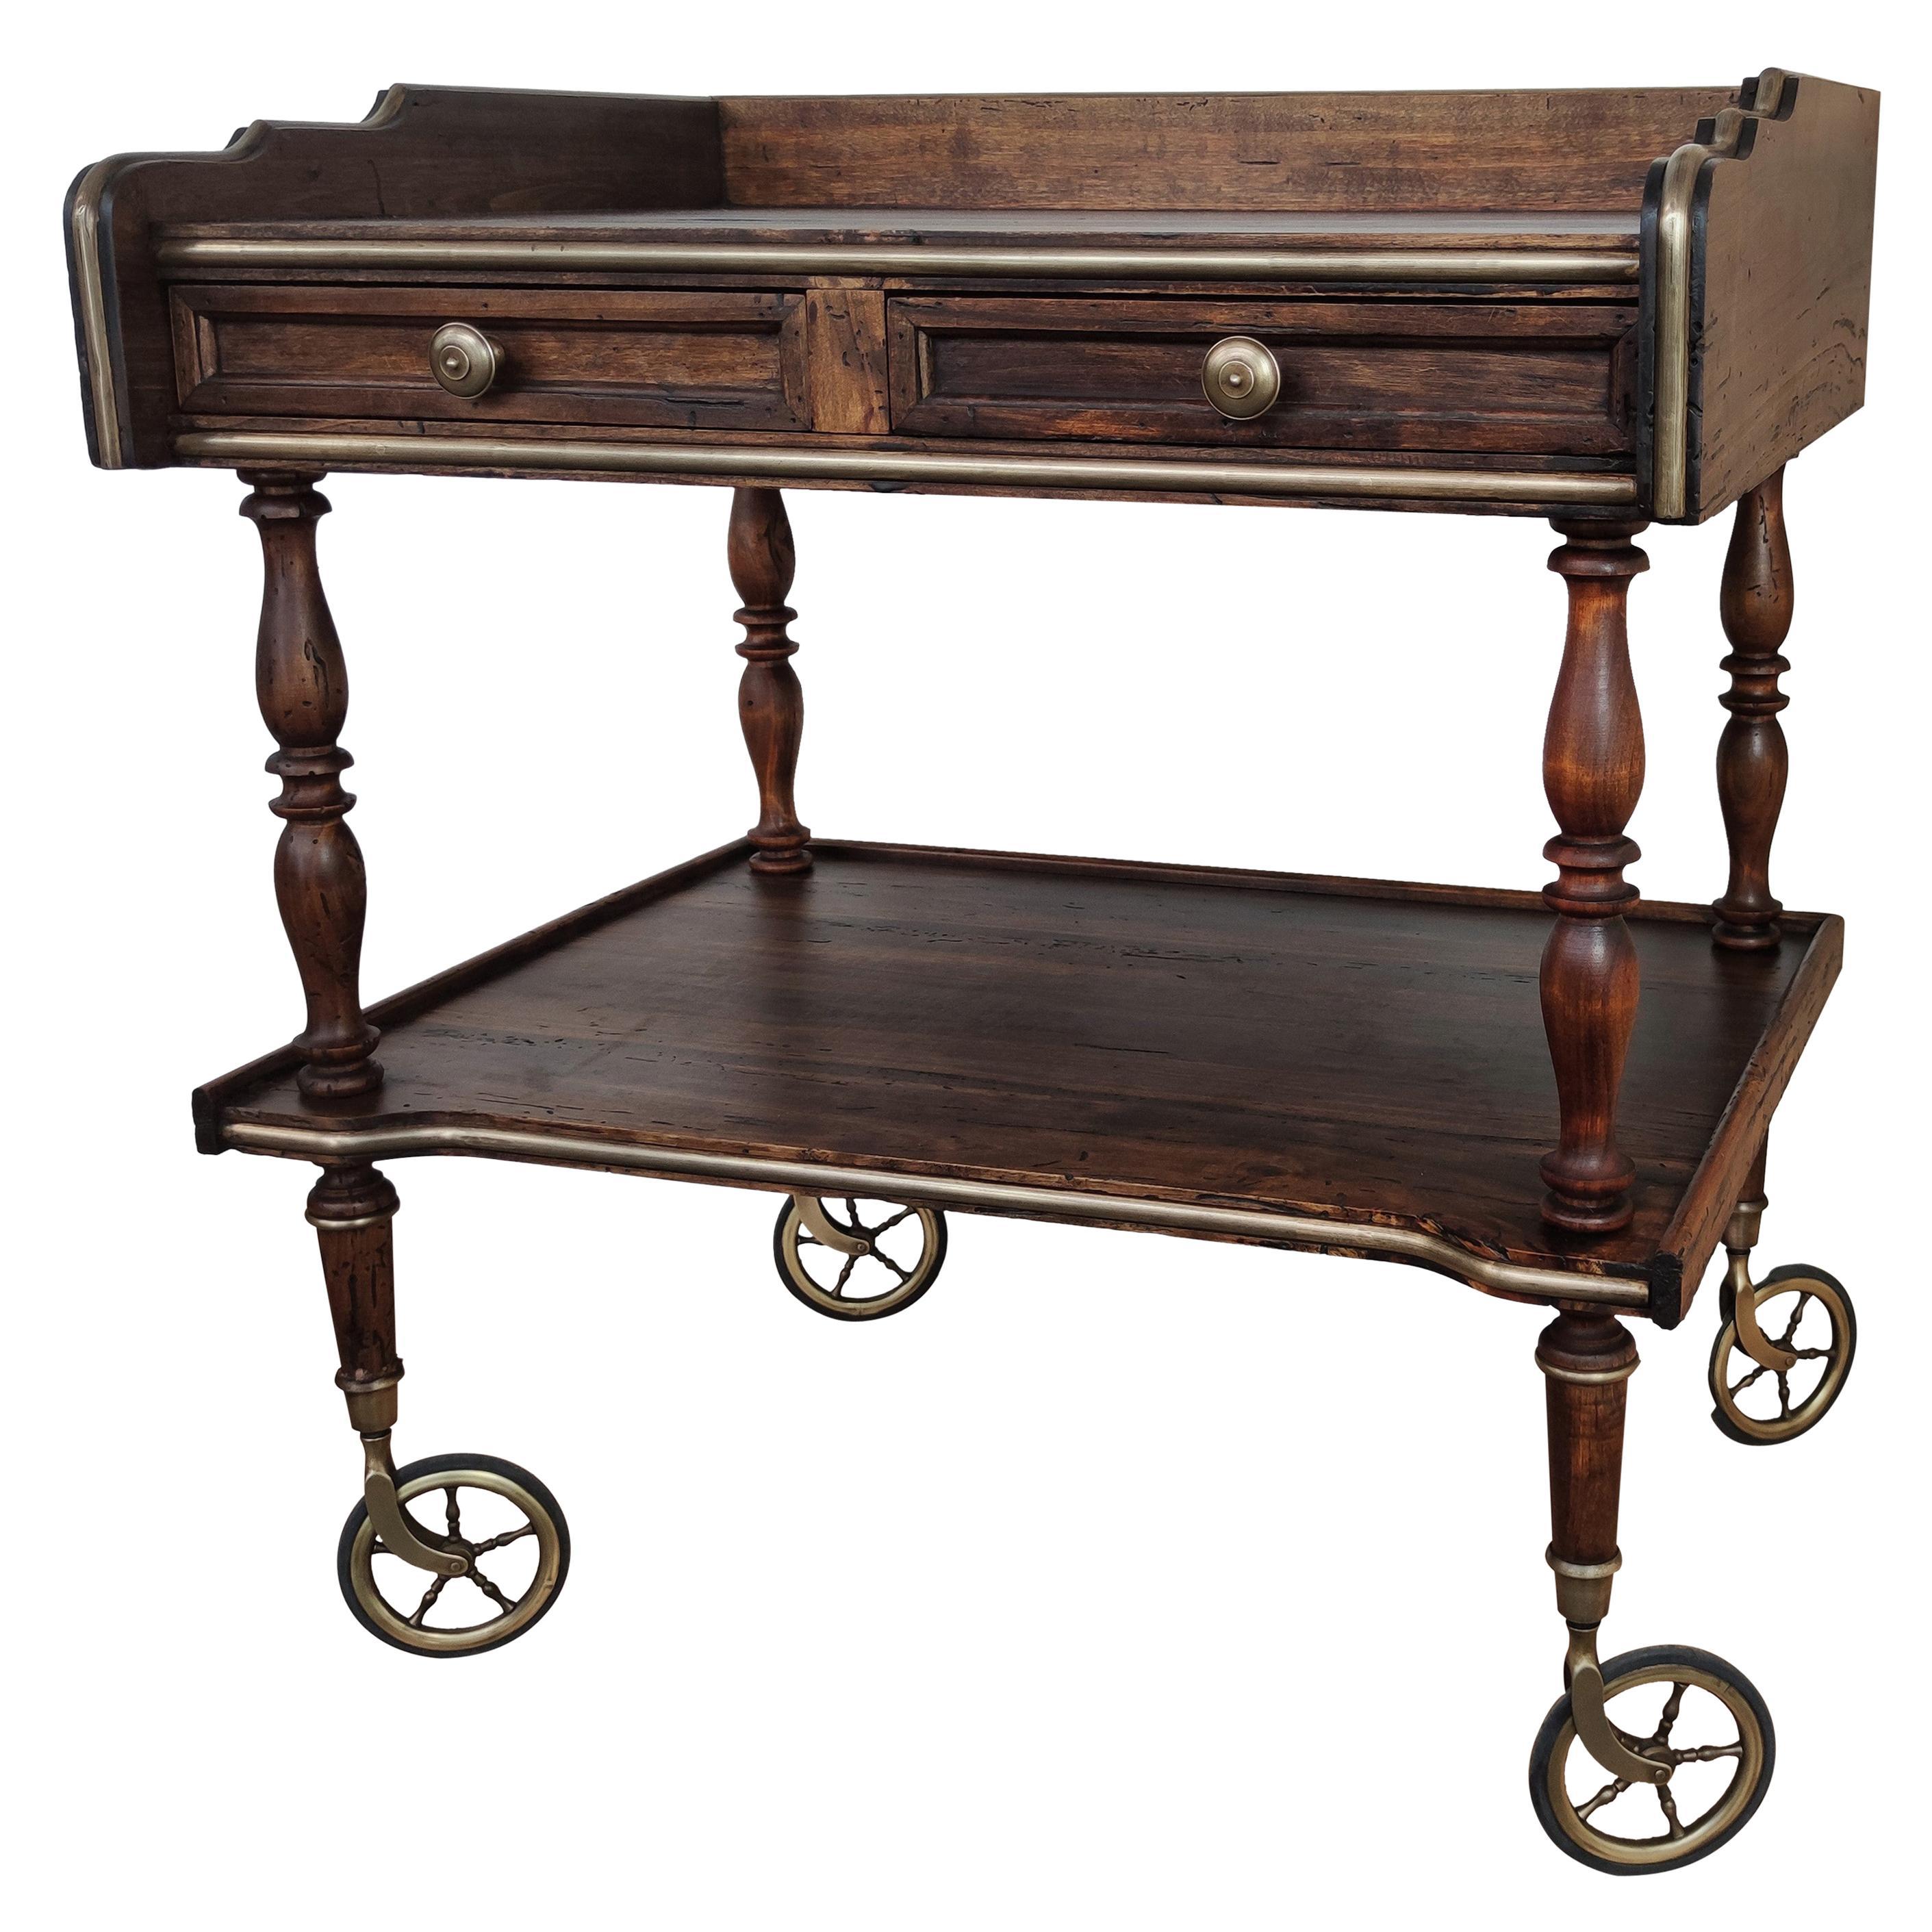 Italian Art Deco Midcentury Regency Wood and Brass Two-Tier Dry Bar Cabinet Cart